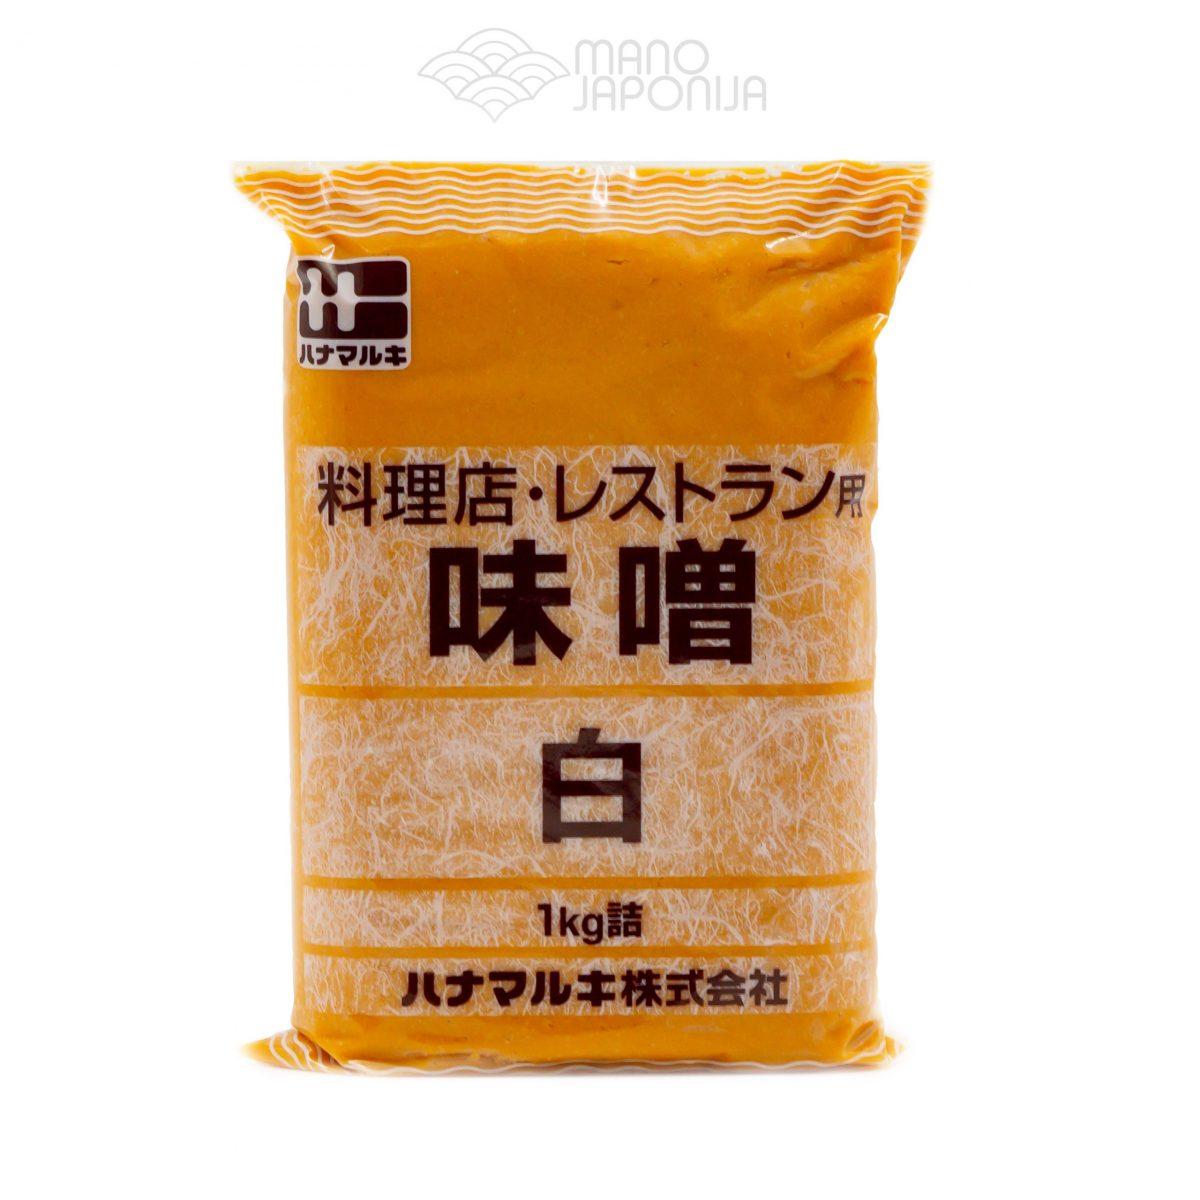 Shiro miso pasta 1 kg